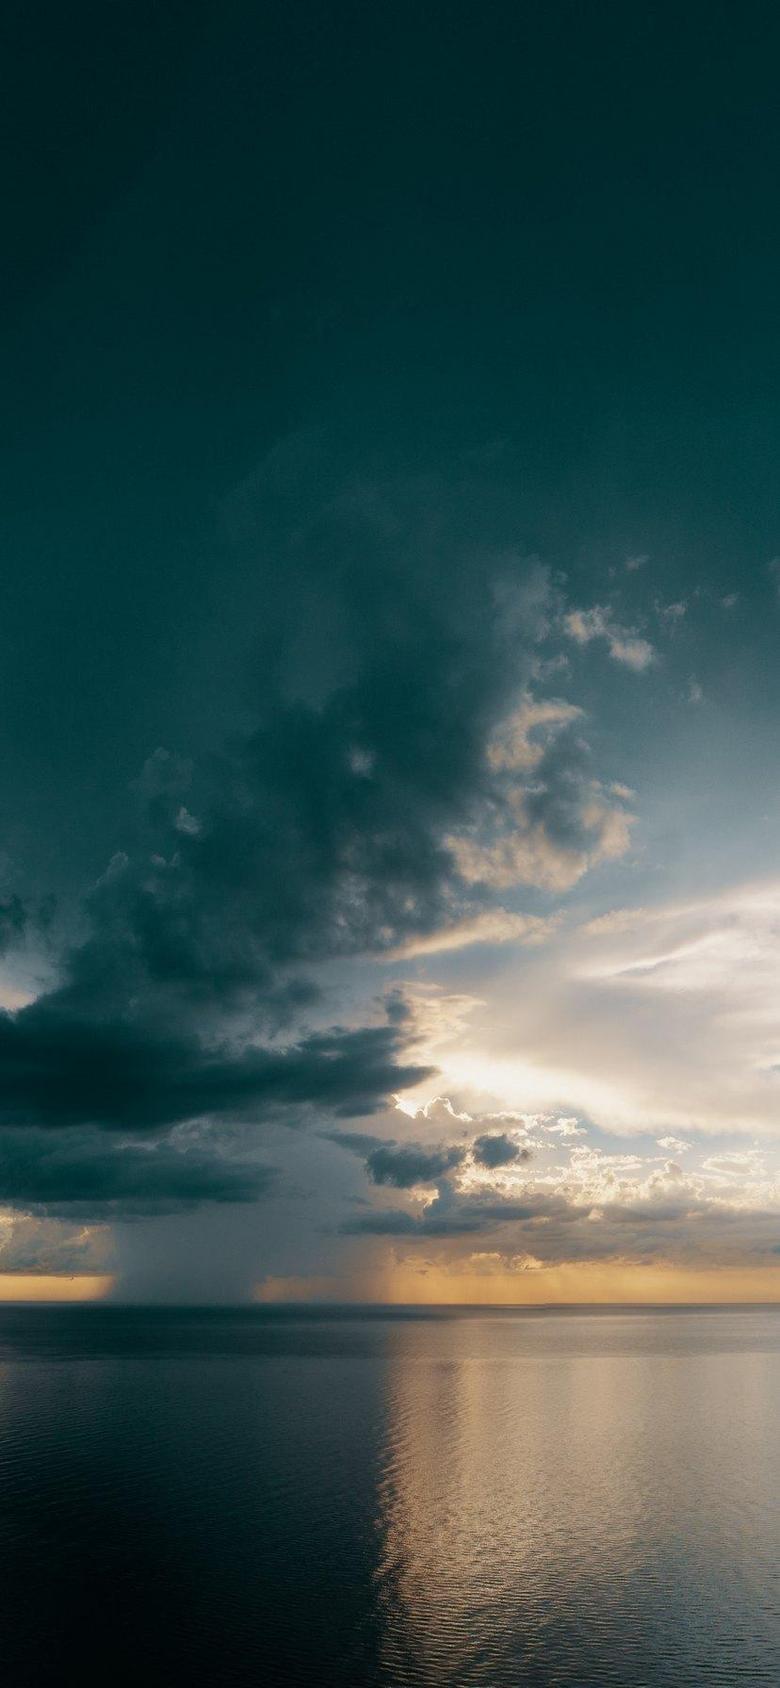 True Nature Calm Ocean in Sunset Wallpapers iPhone Xr 11